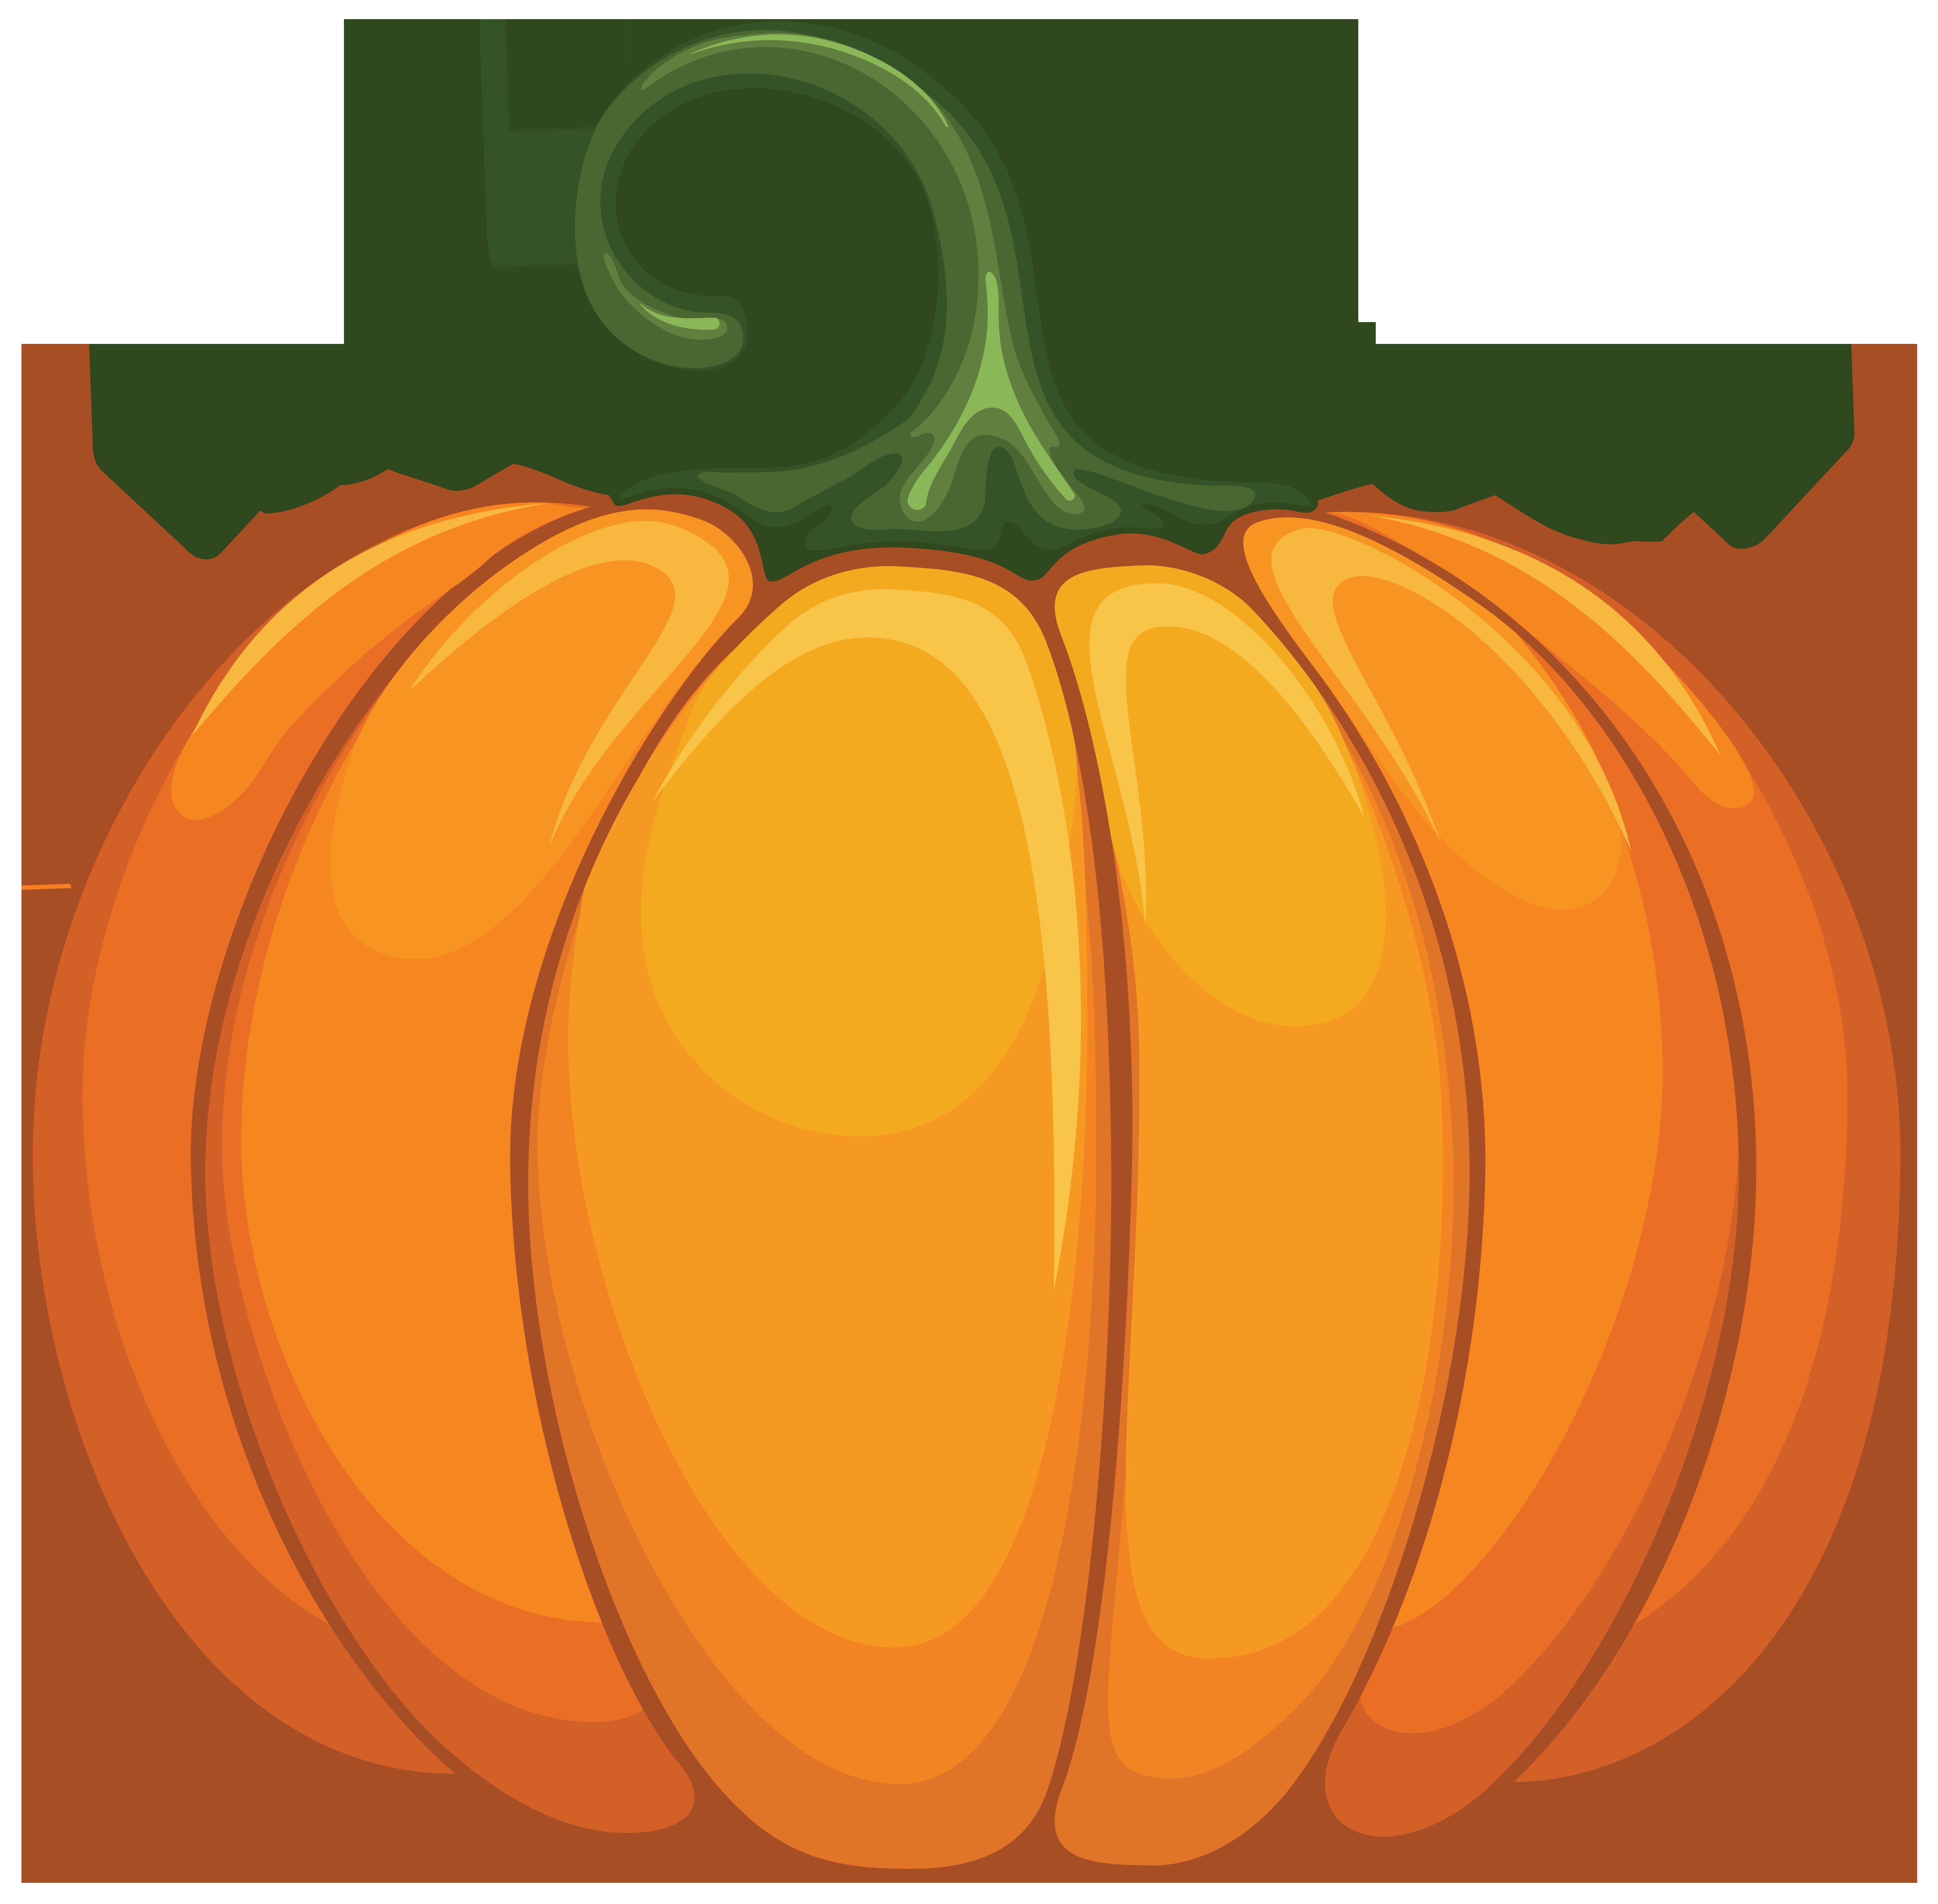 Transparent Pumpkin Clipart.